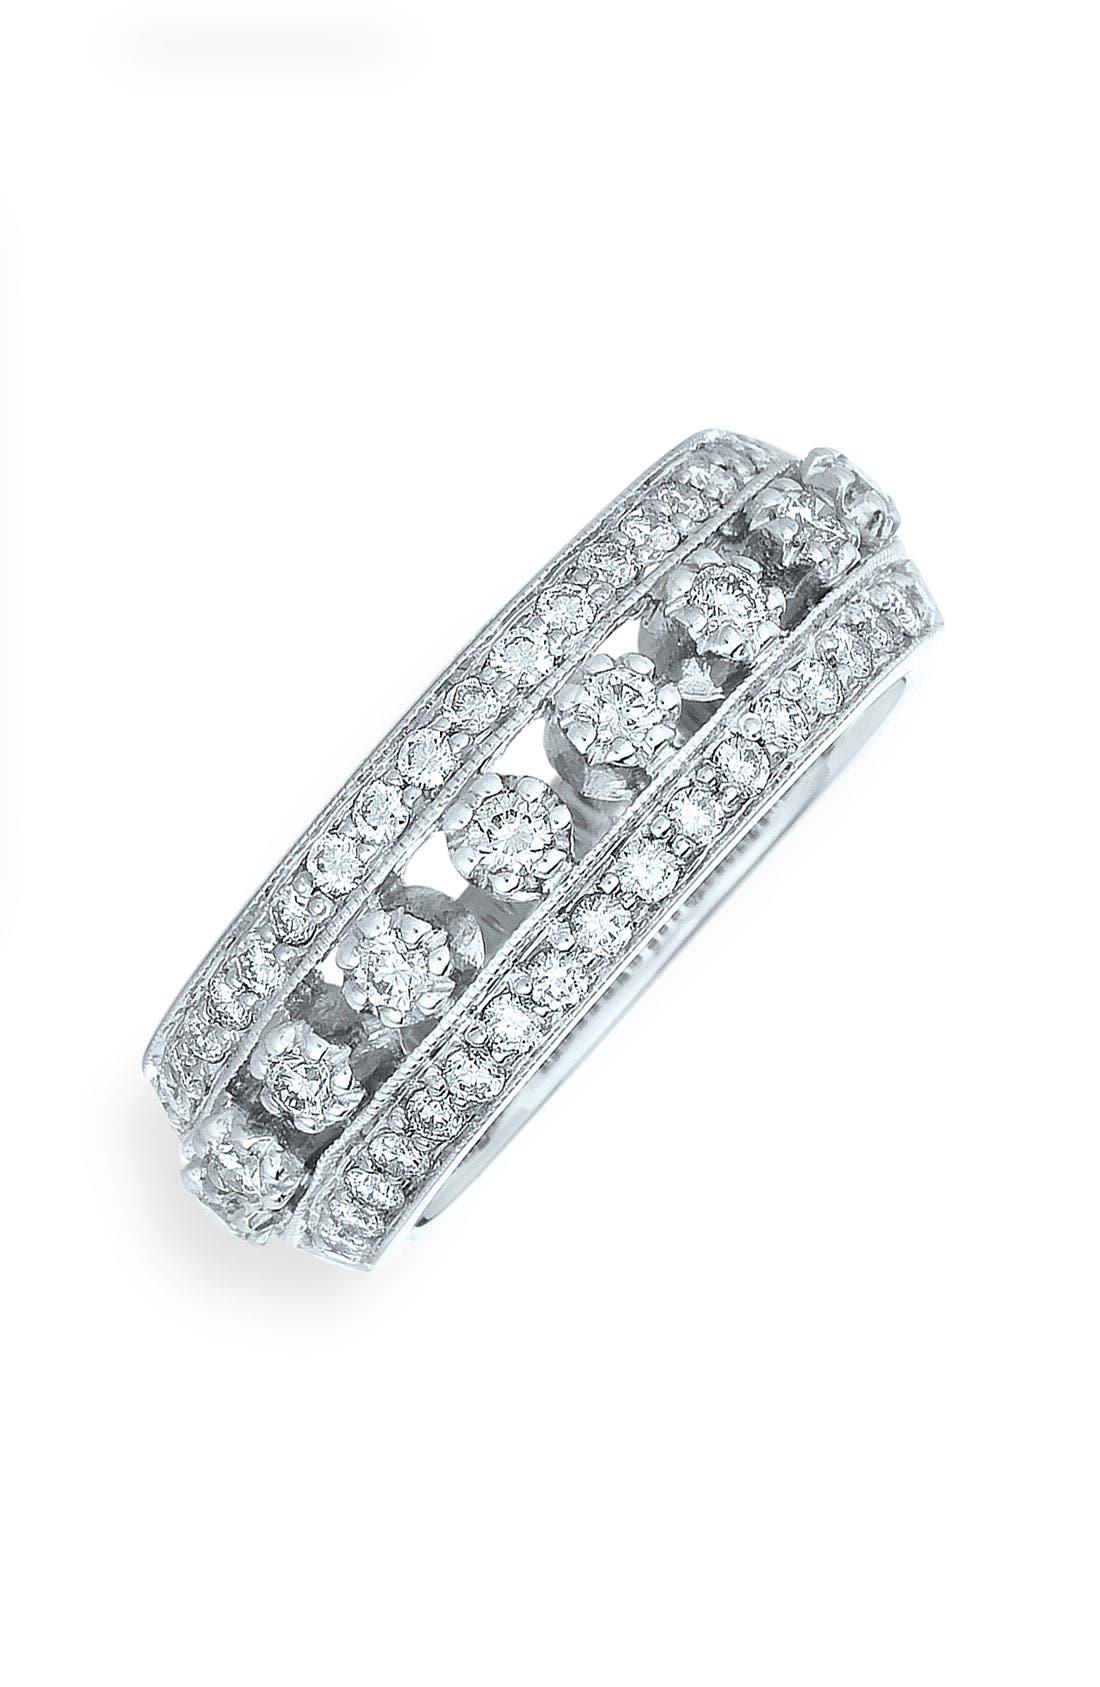 Alternate Image 1 Selected - Kwiat 'Stardust' 18k White Gold & Diamond Ring